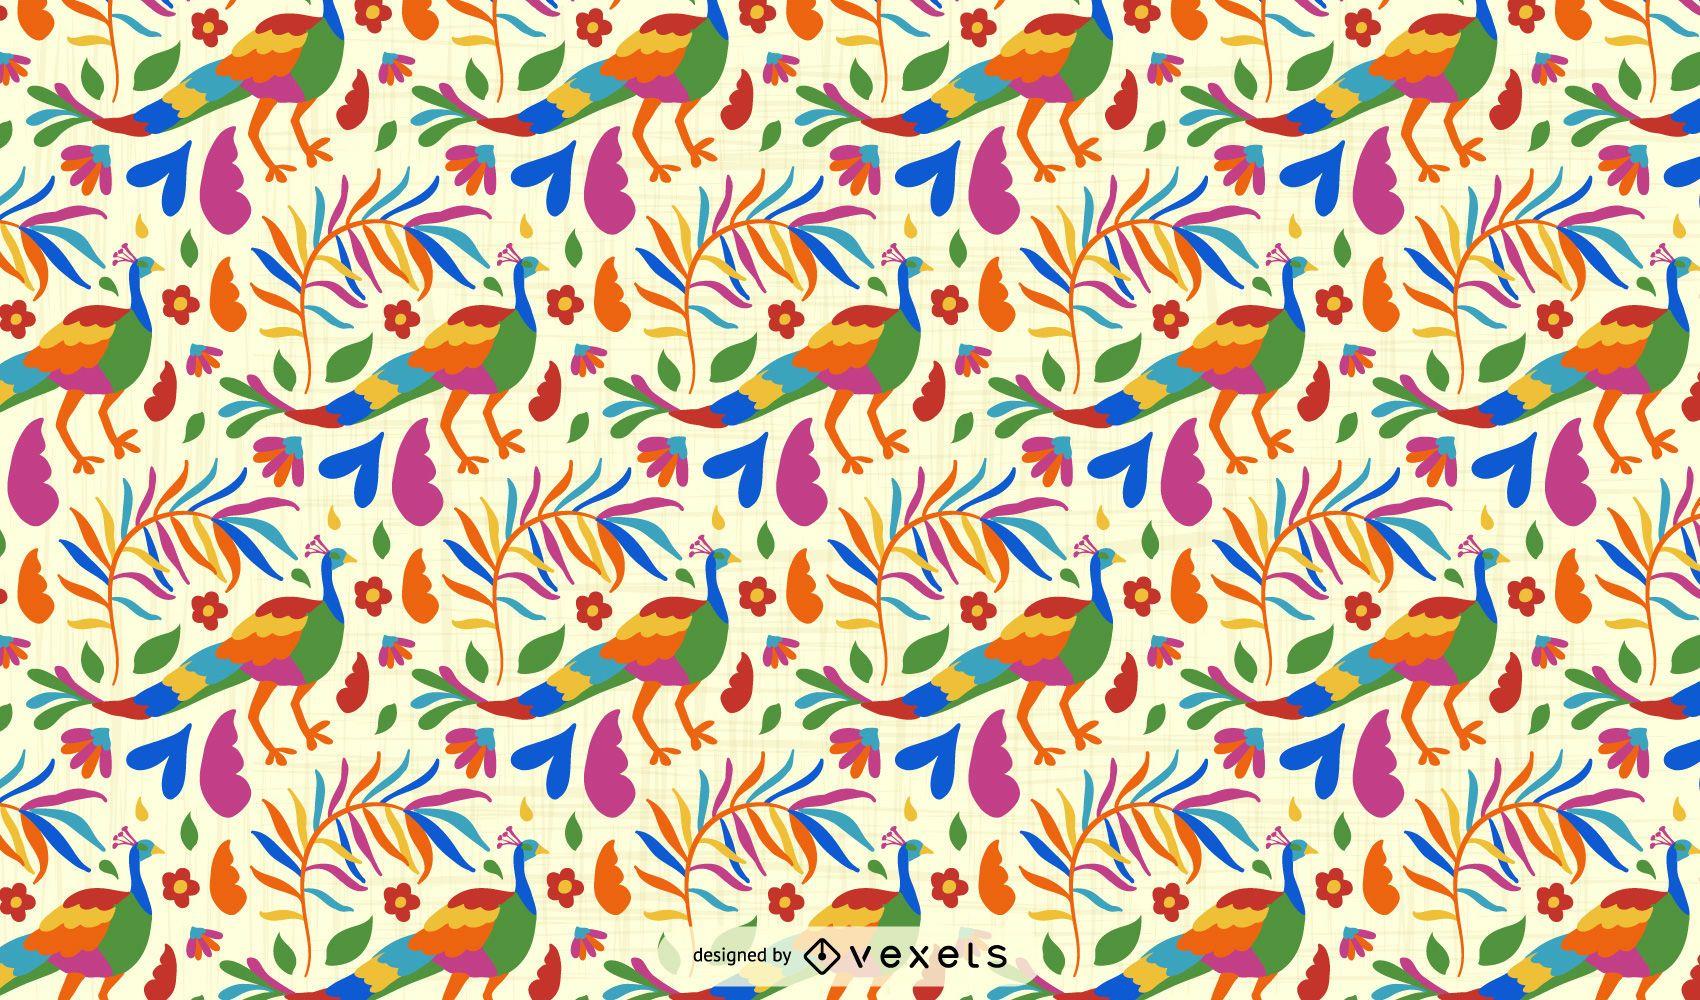 Otomi Style Peacock Pattern Design